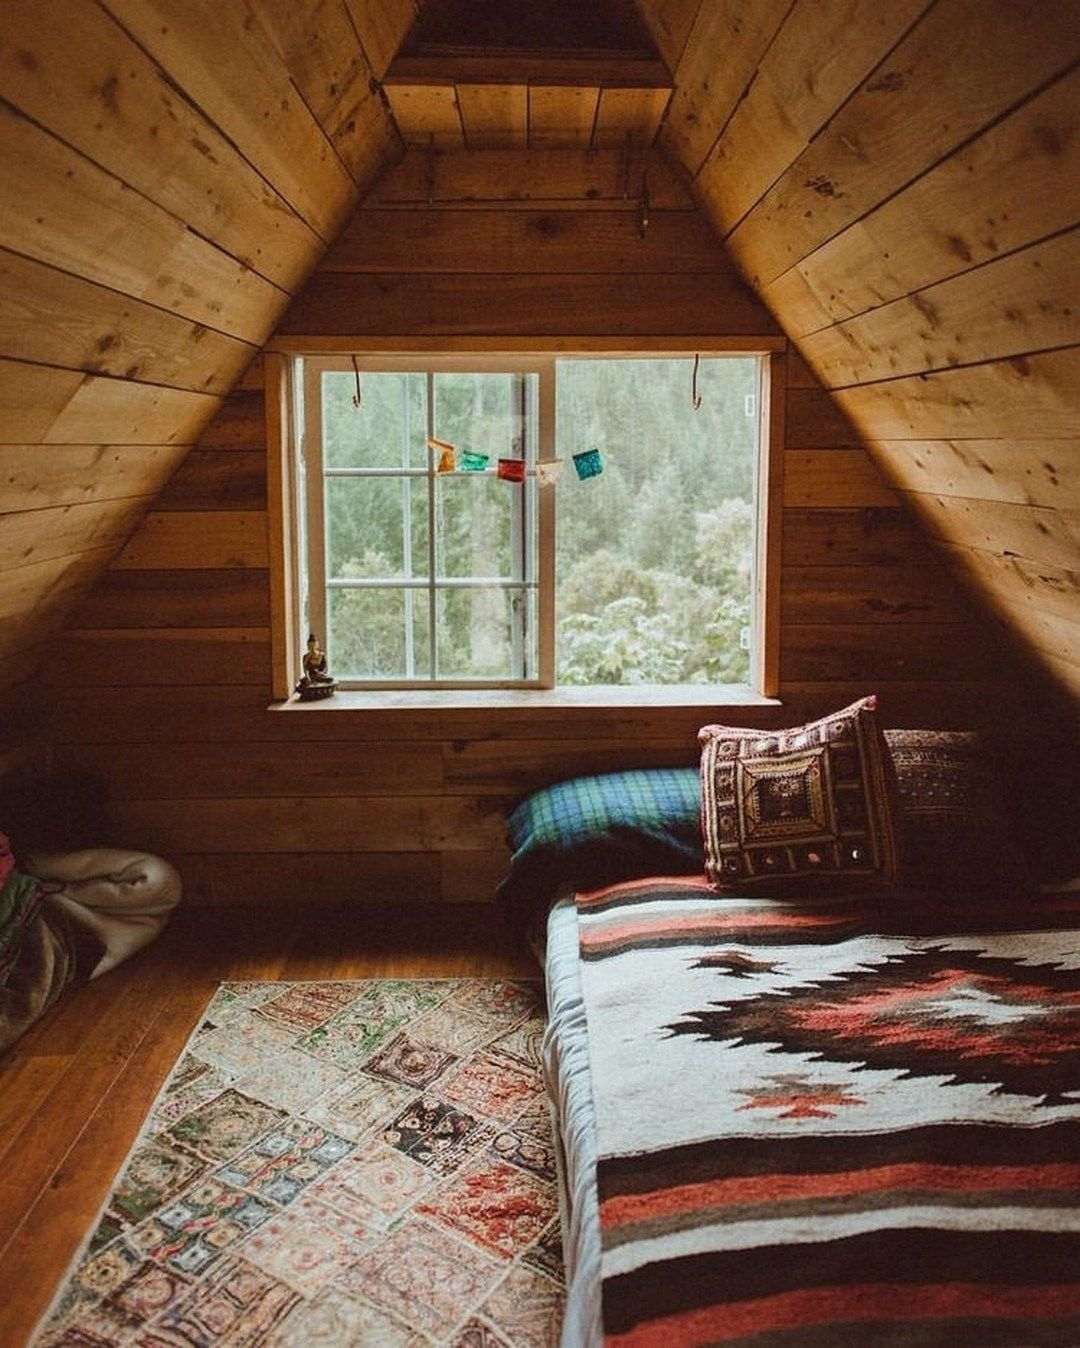 Rustic And Cozy Boho Cabin Makeover On A Budget 12 Decomagz Attic Renovation Cabin Attic Rooms